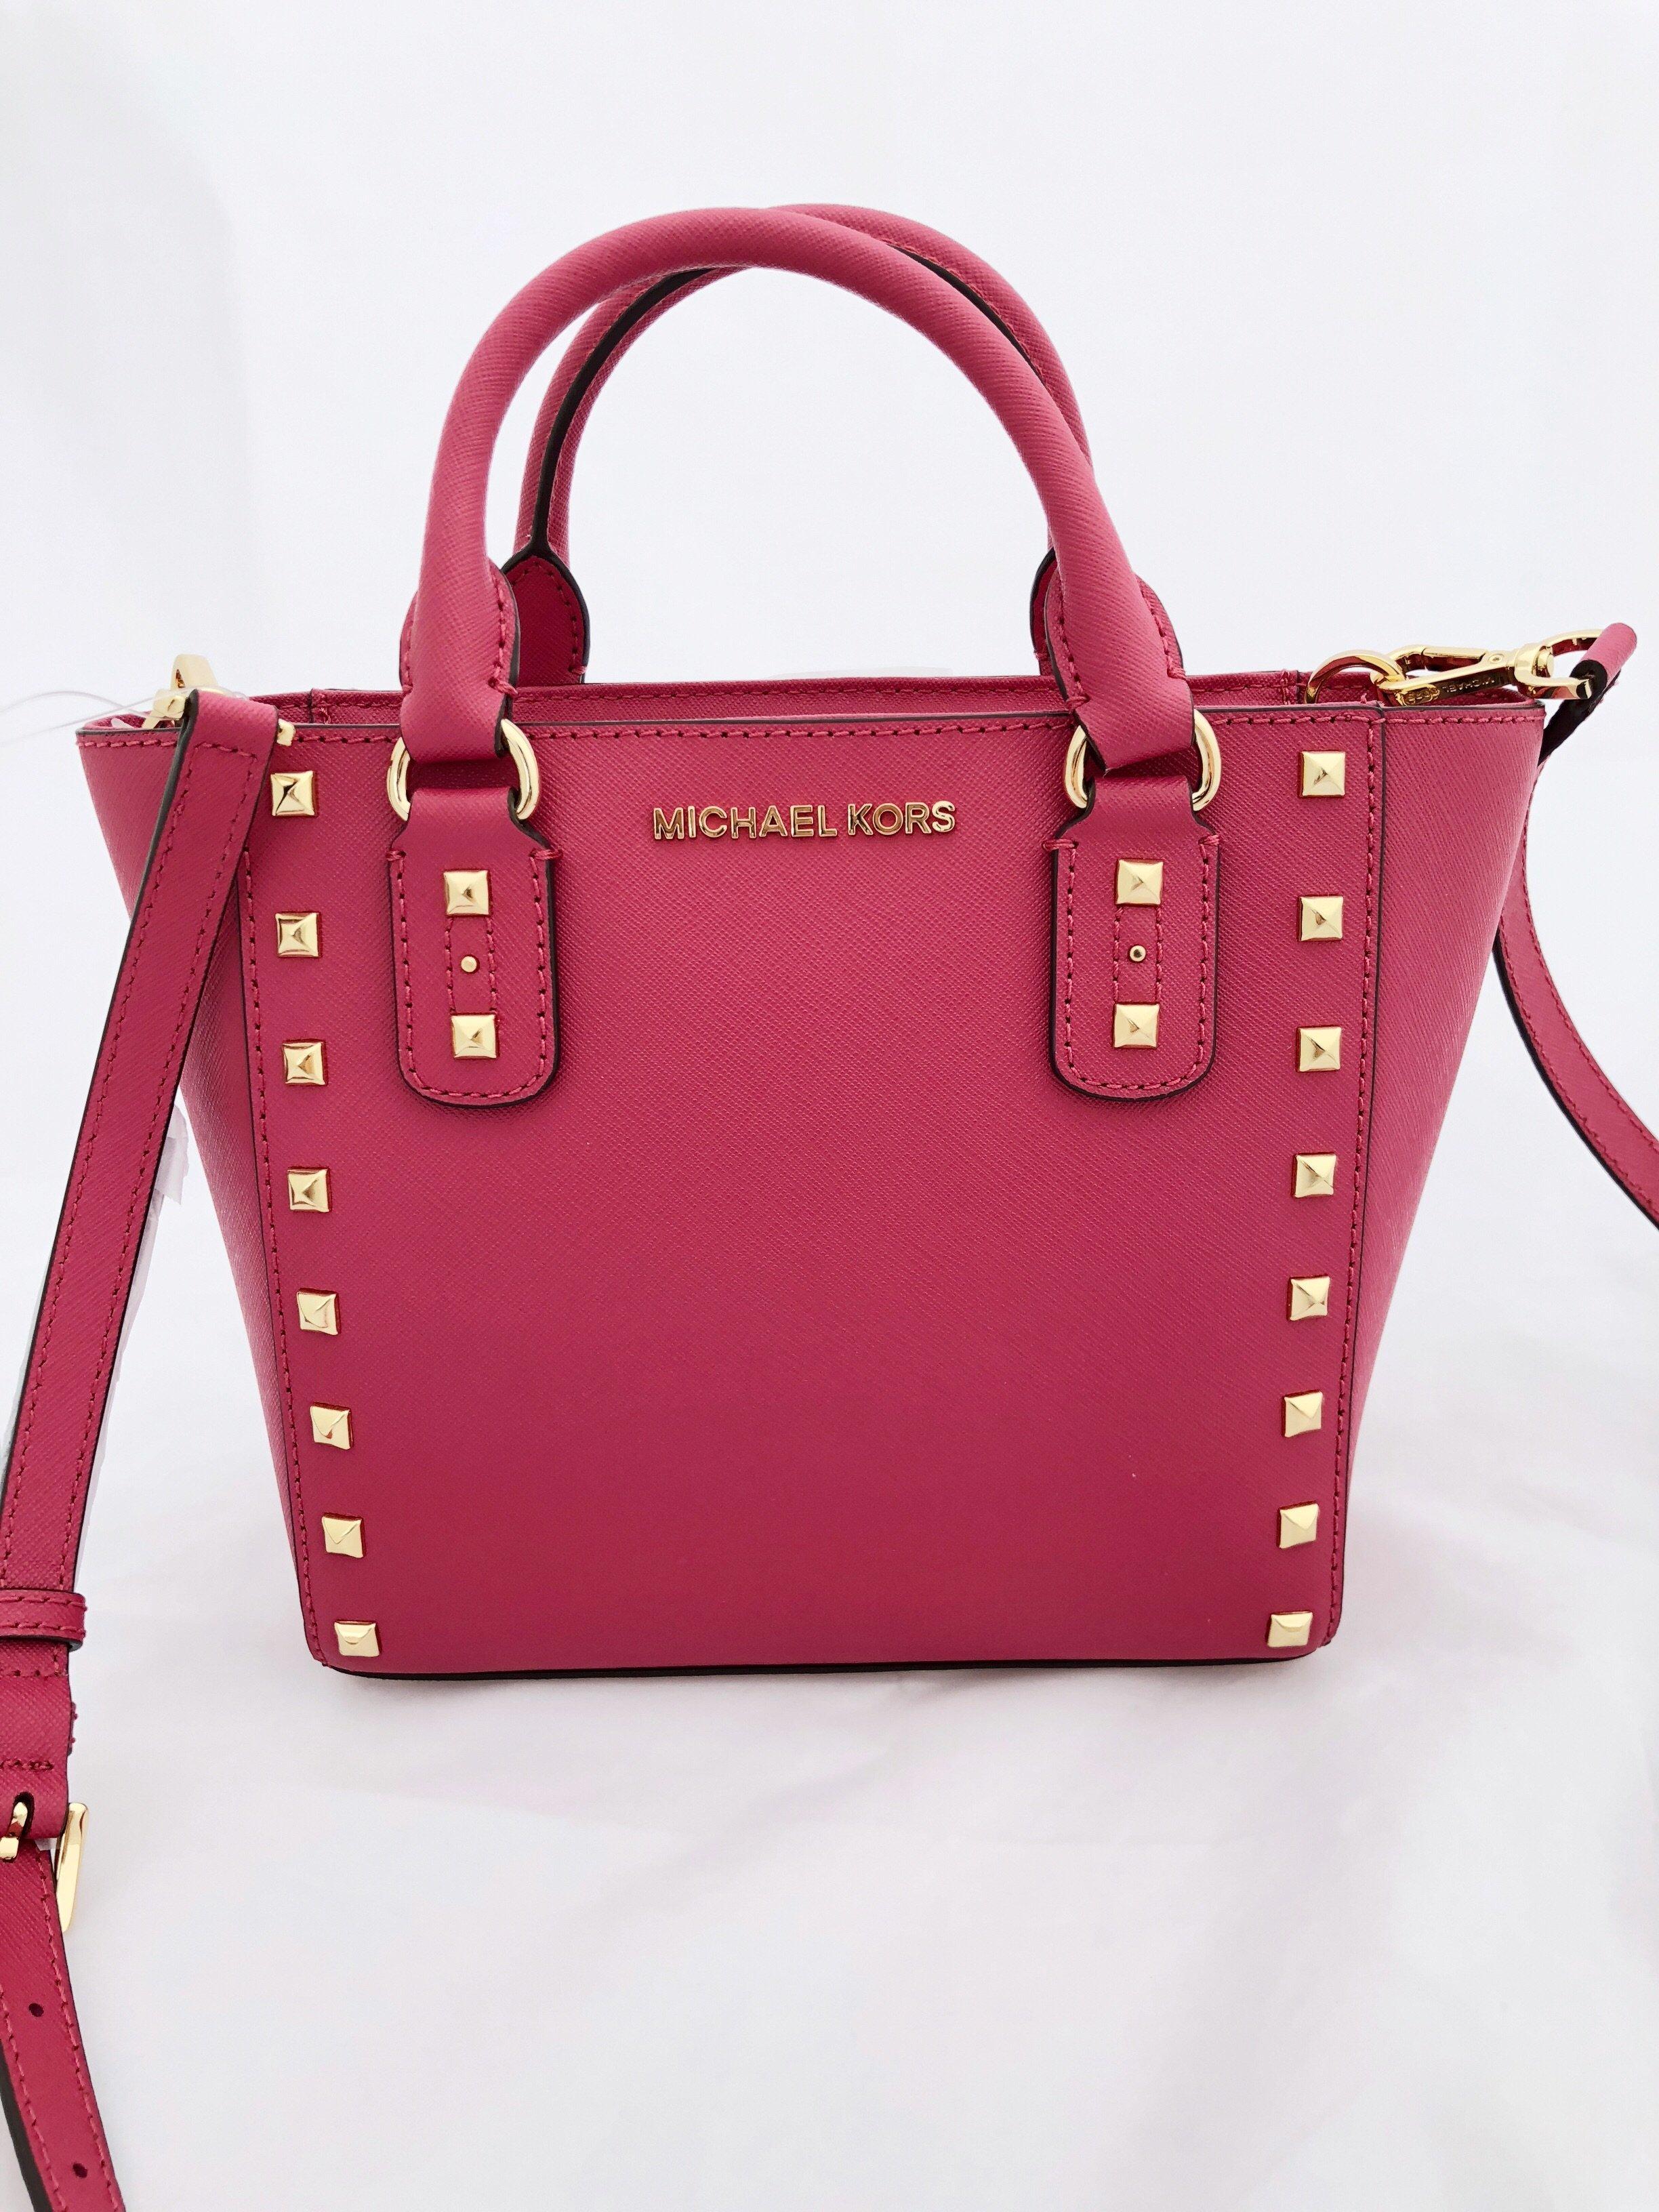 5f34bce89aaf Michael Kors - Michael Kors Sandrine Pyramid Stud Mini Tote Crossbody Bag  Lipstick Ultra Pink - Walmart.com